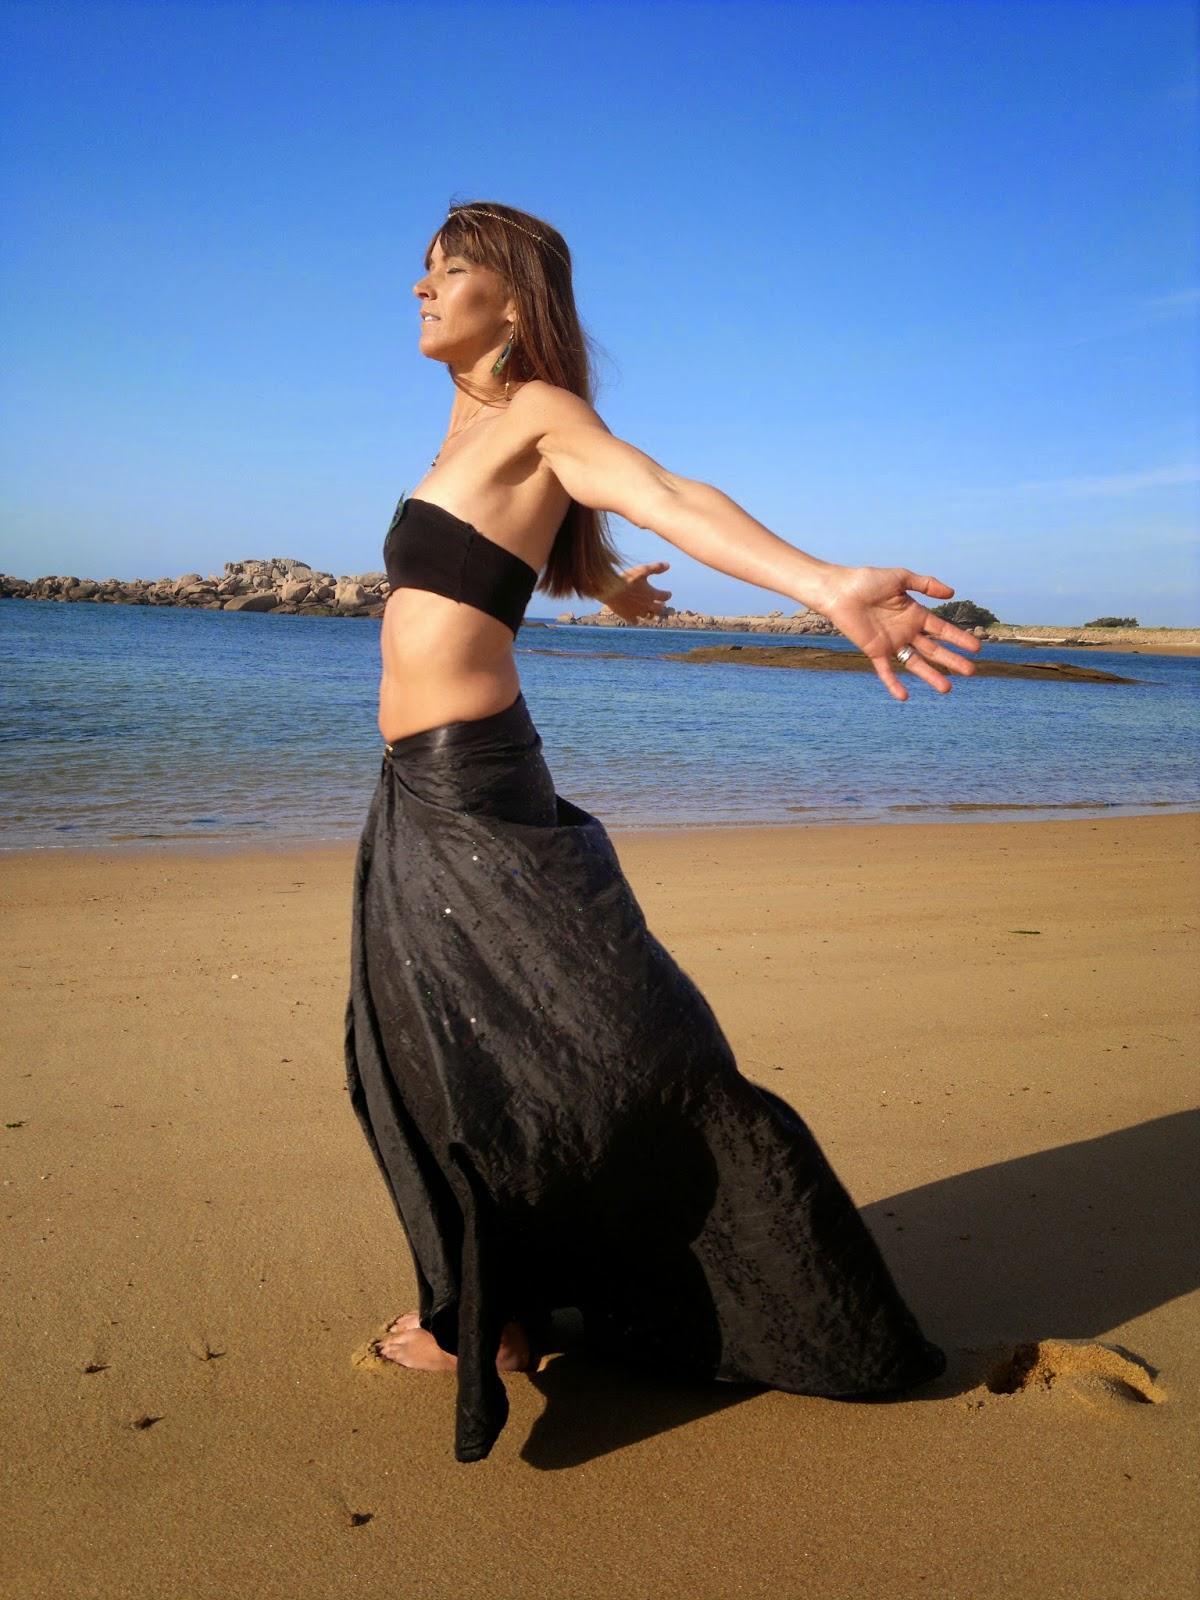 http://www.alittlemarket.com/jupe/fr_au_inspiration_d_egypte_jupe_longue_avec_traine_-9303591.html